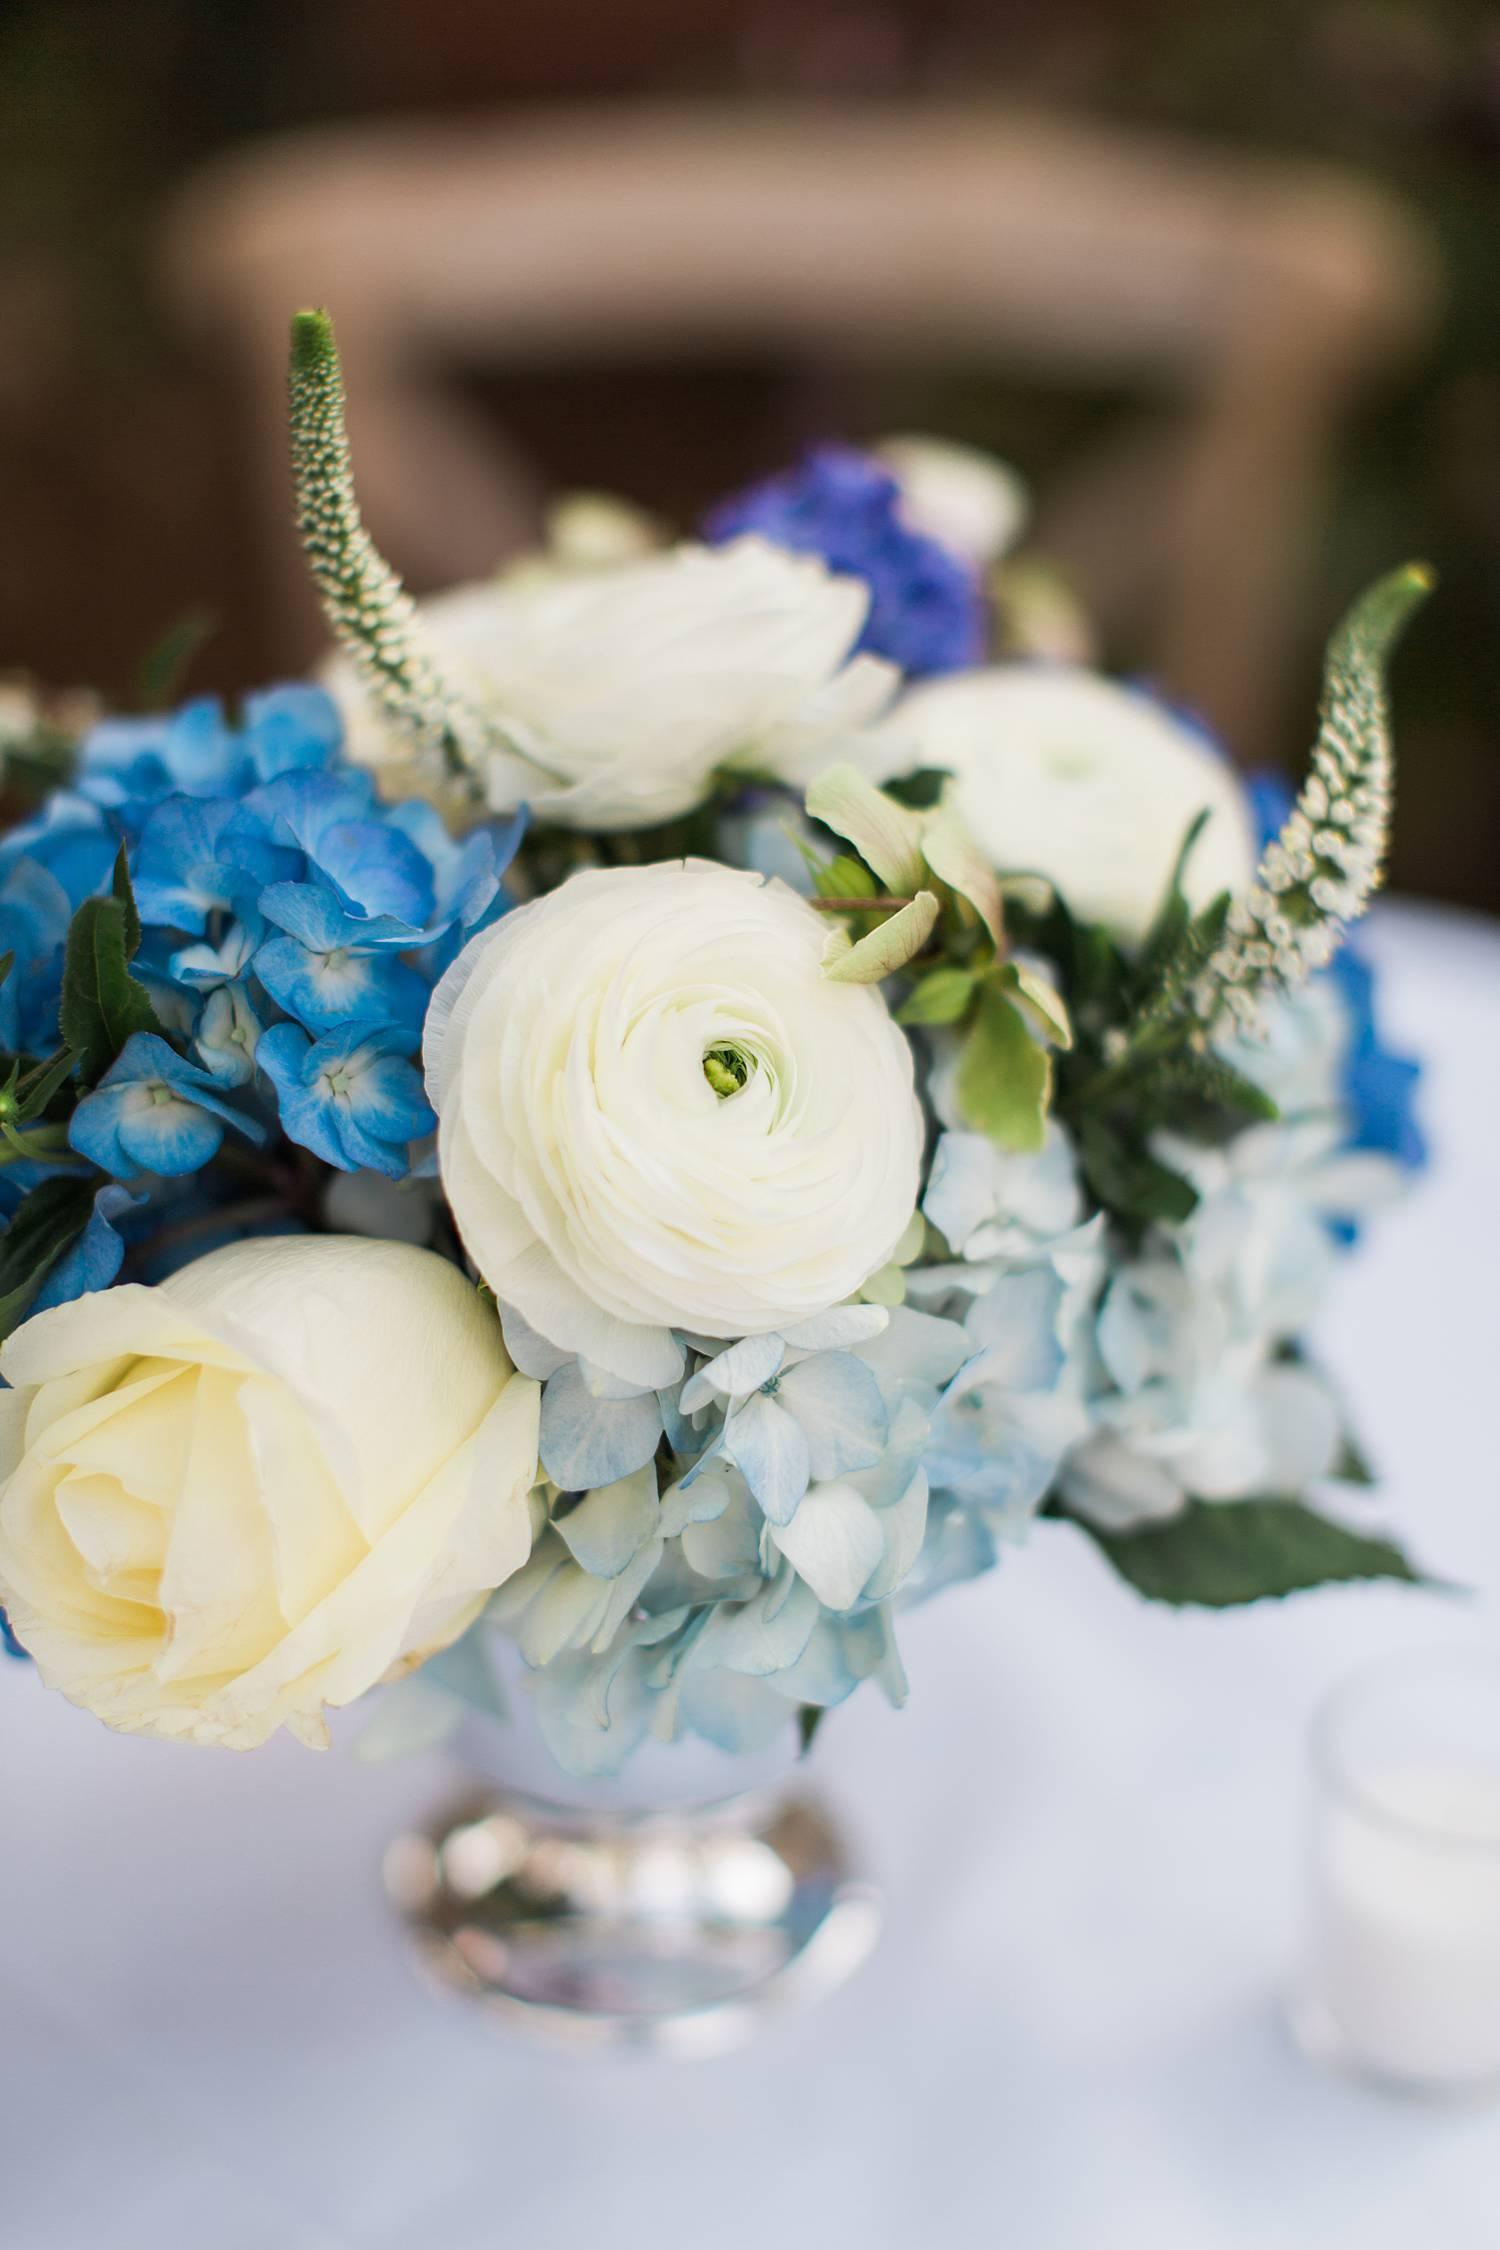 Blue + White + Silver - fresh + timeless